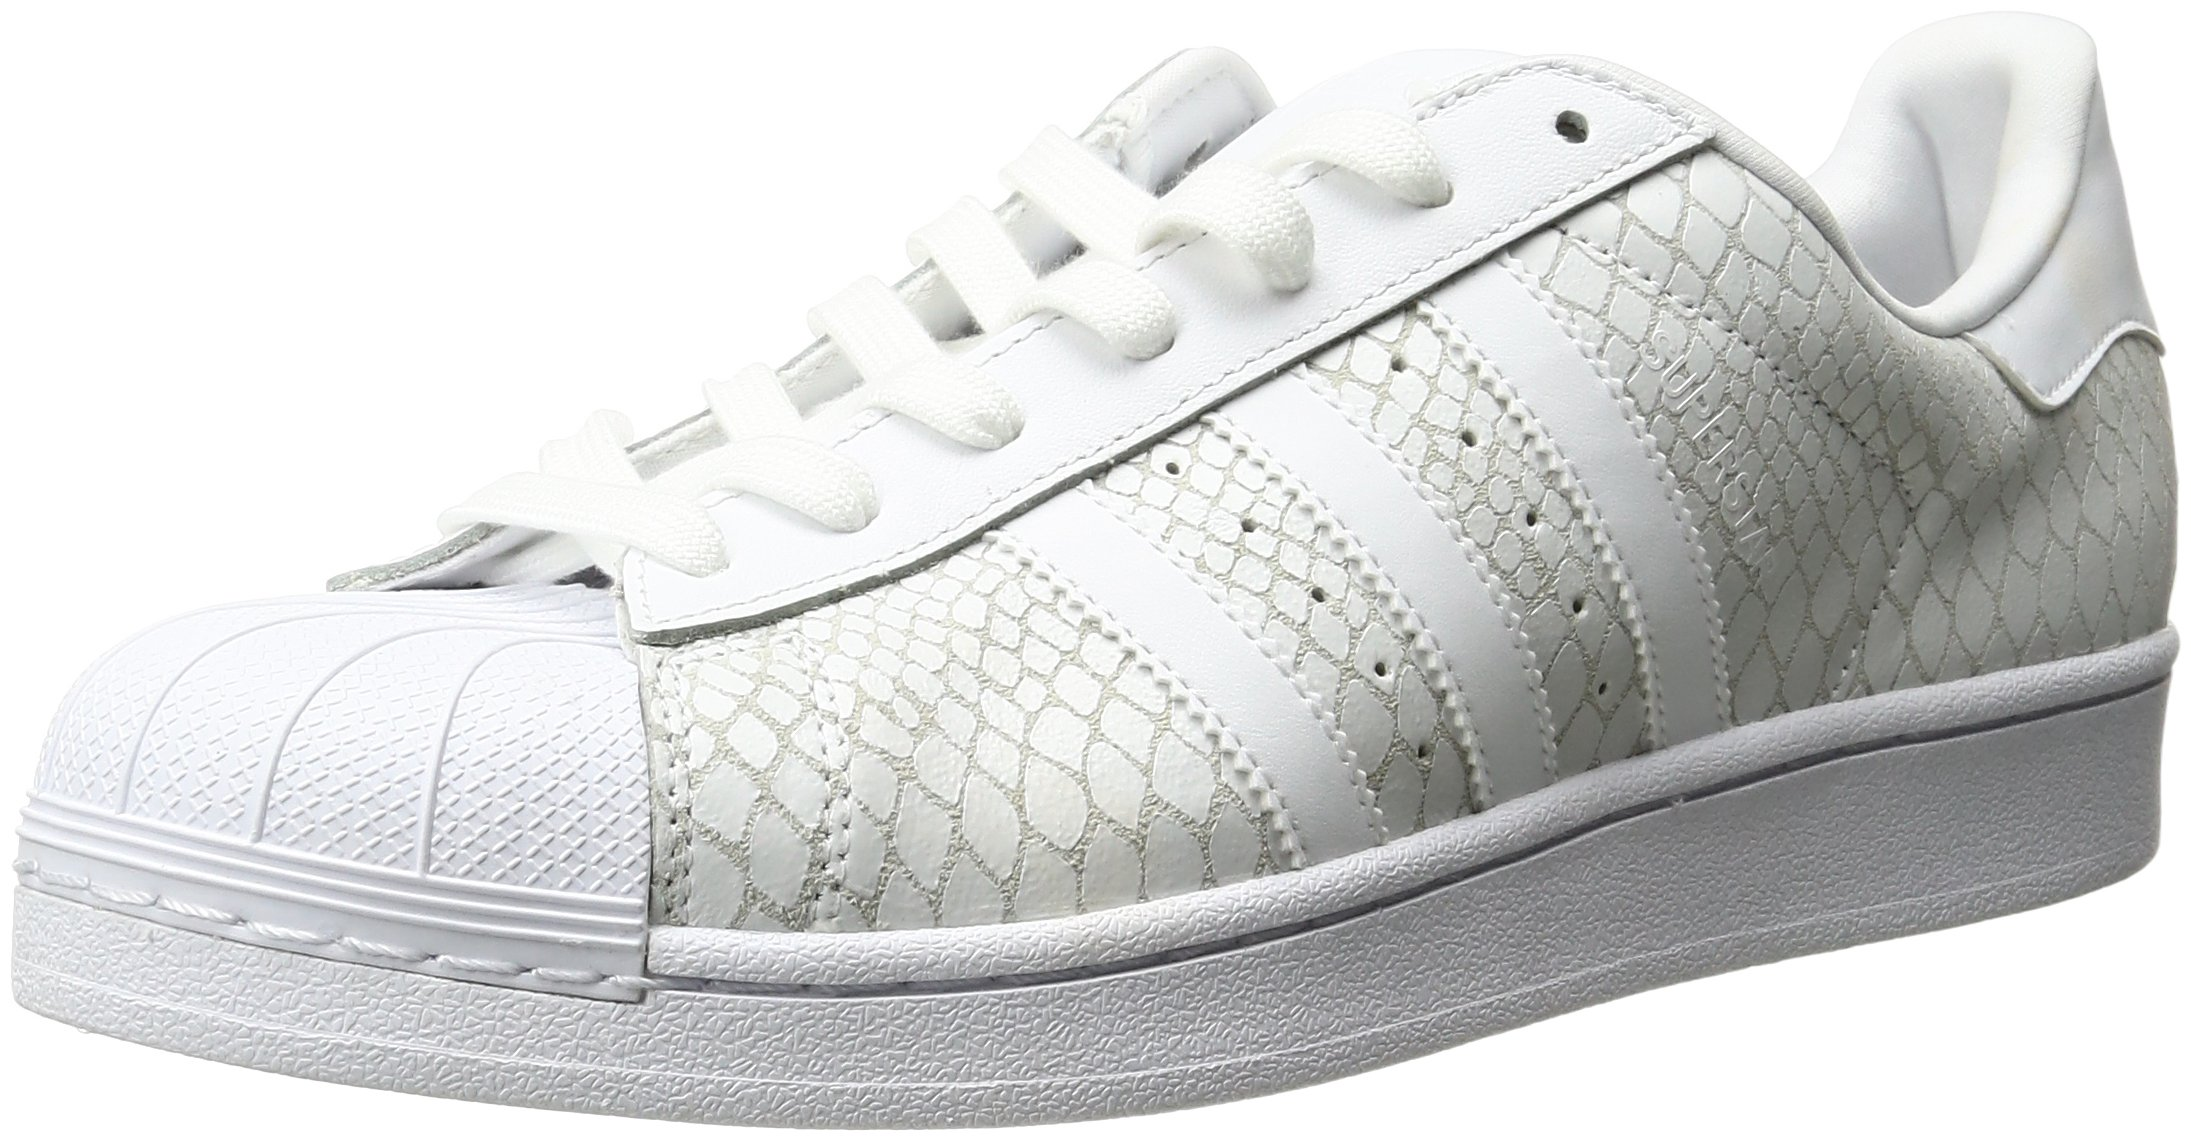 adidas originali delle superstar w moda scarpe 280842 < road